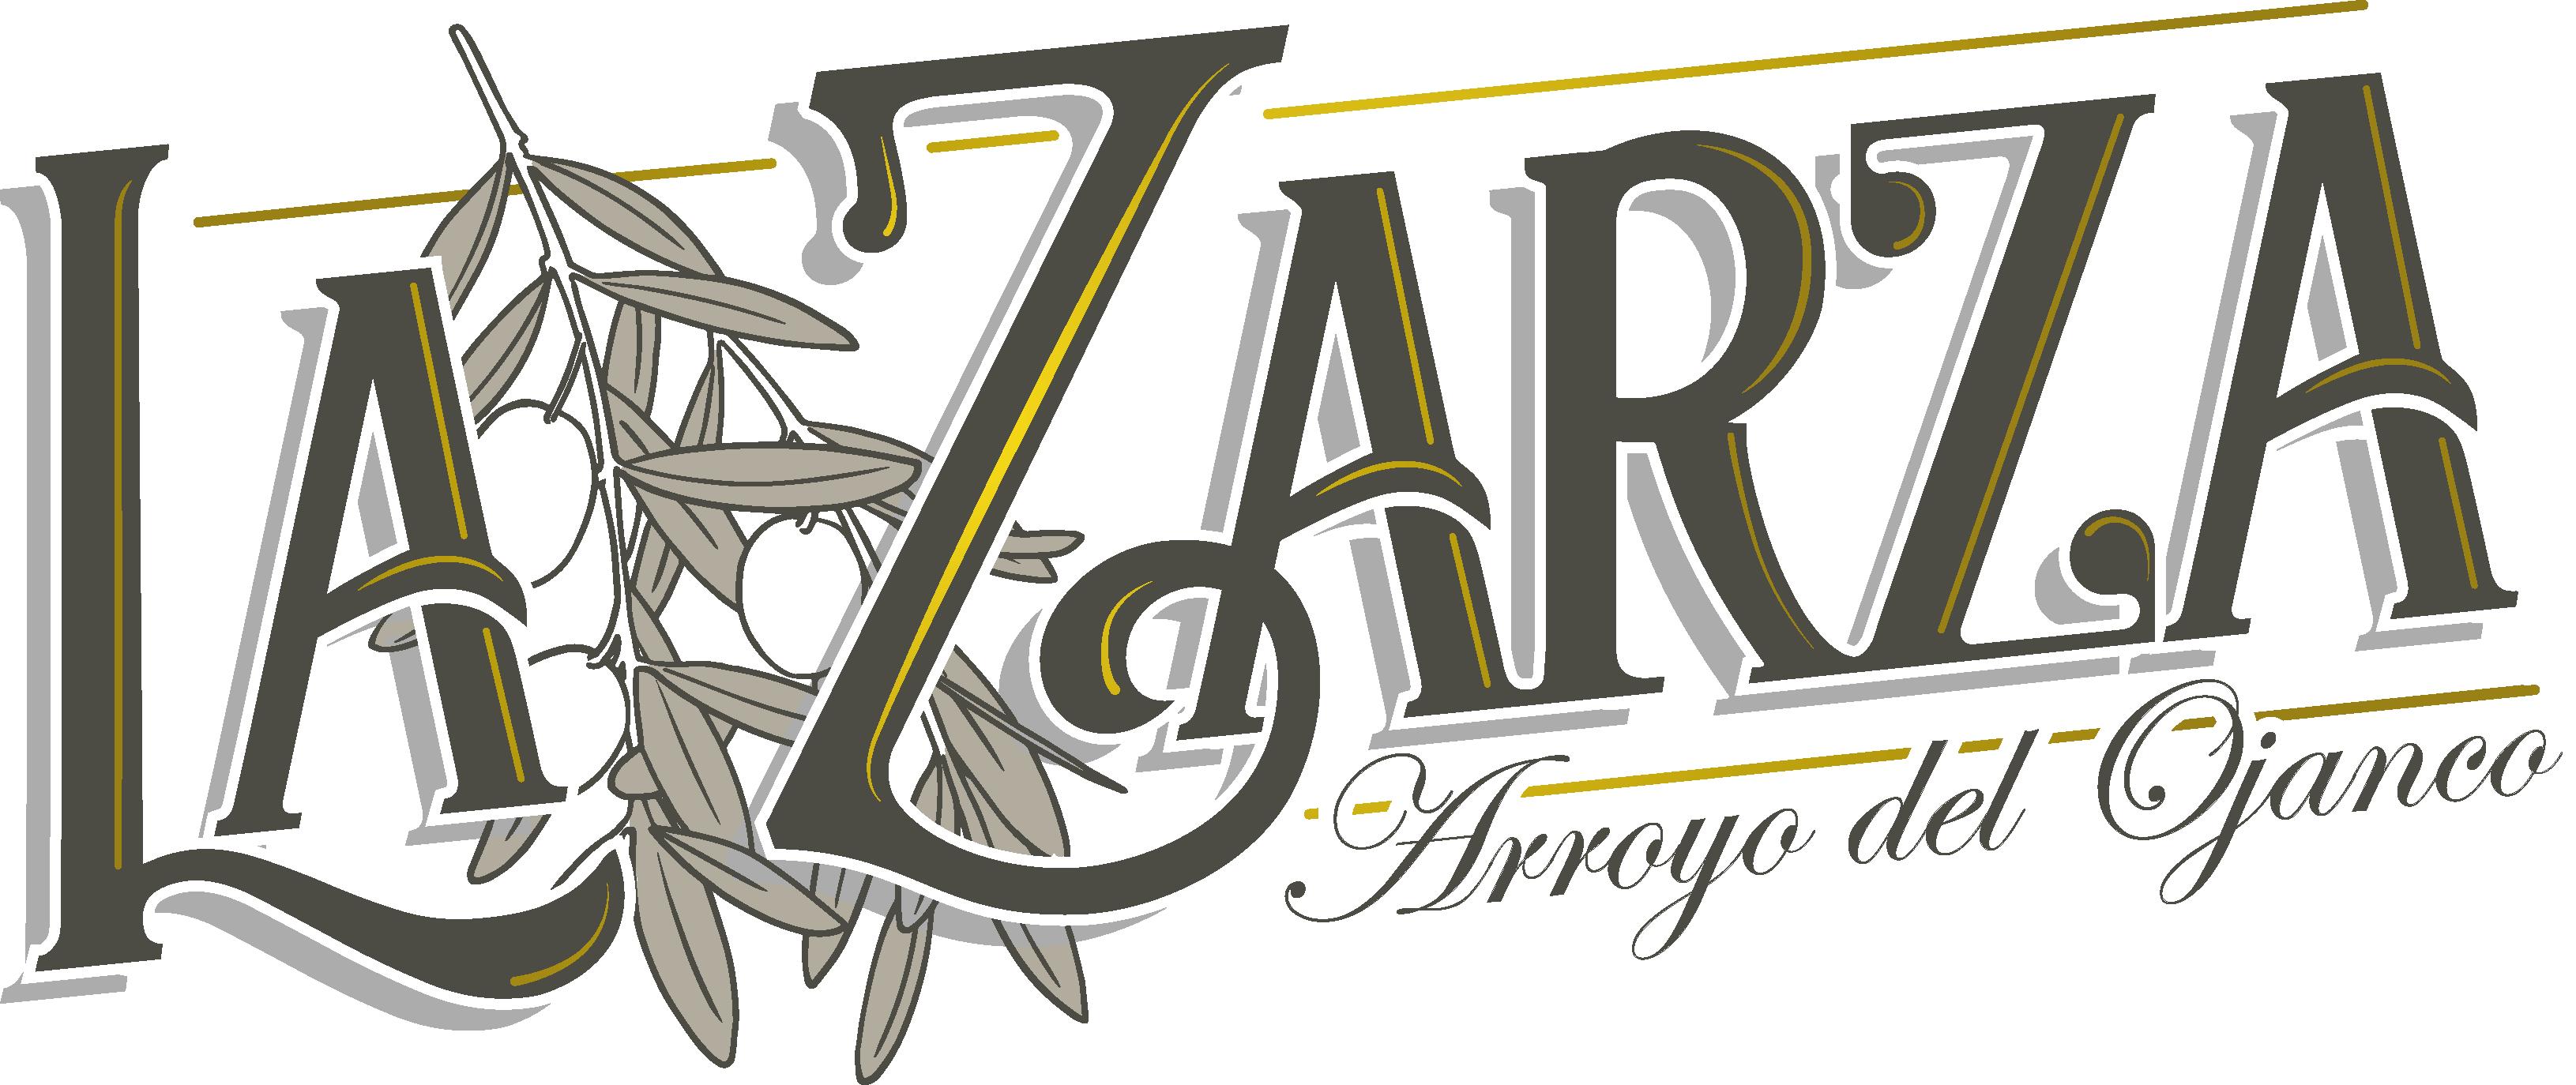 Cortijo la Zarza